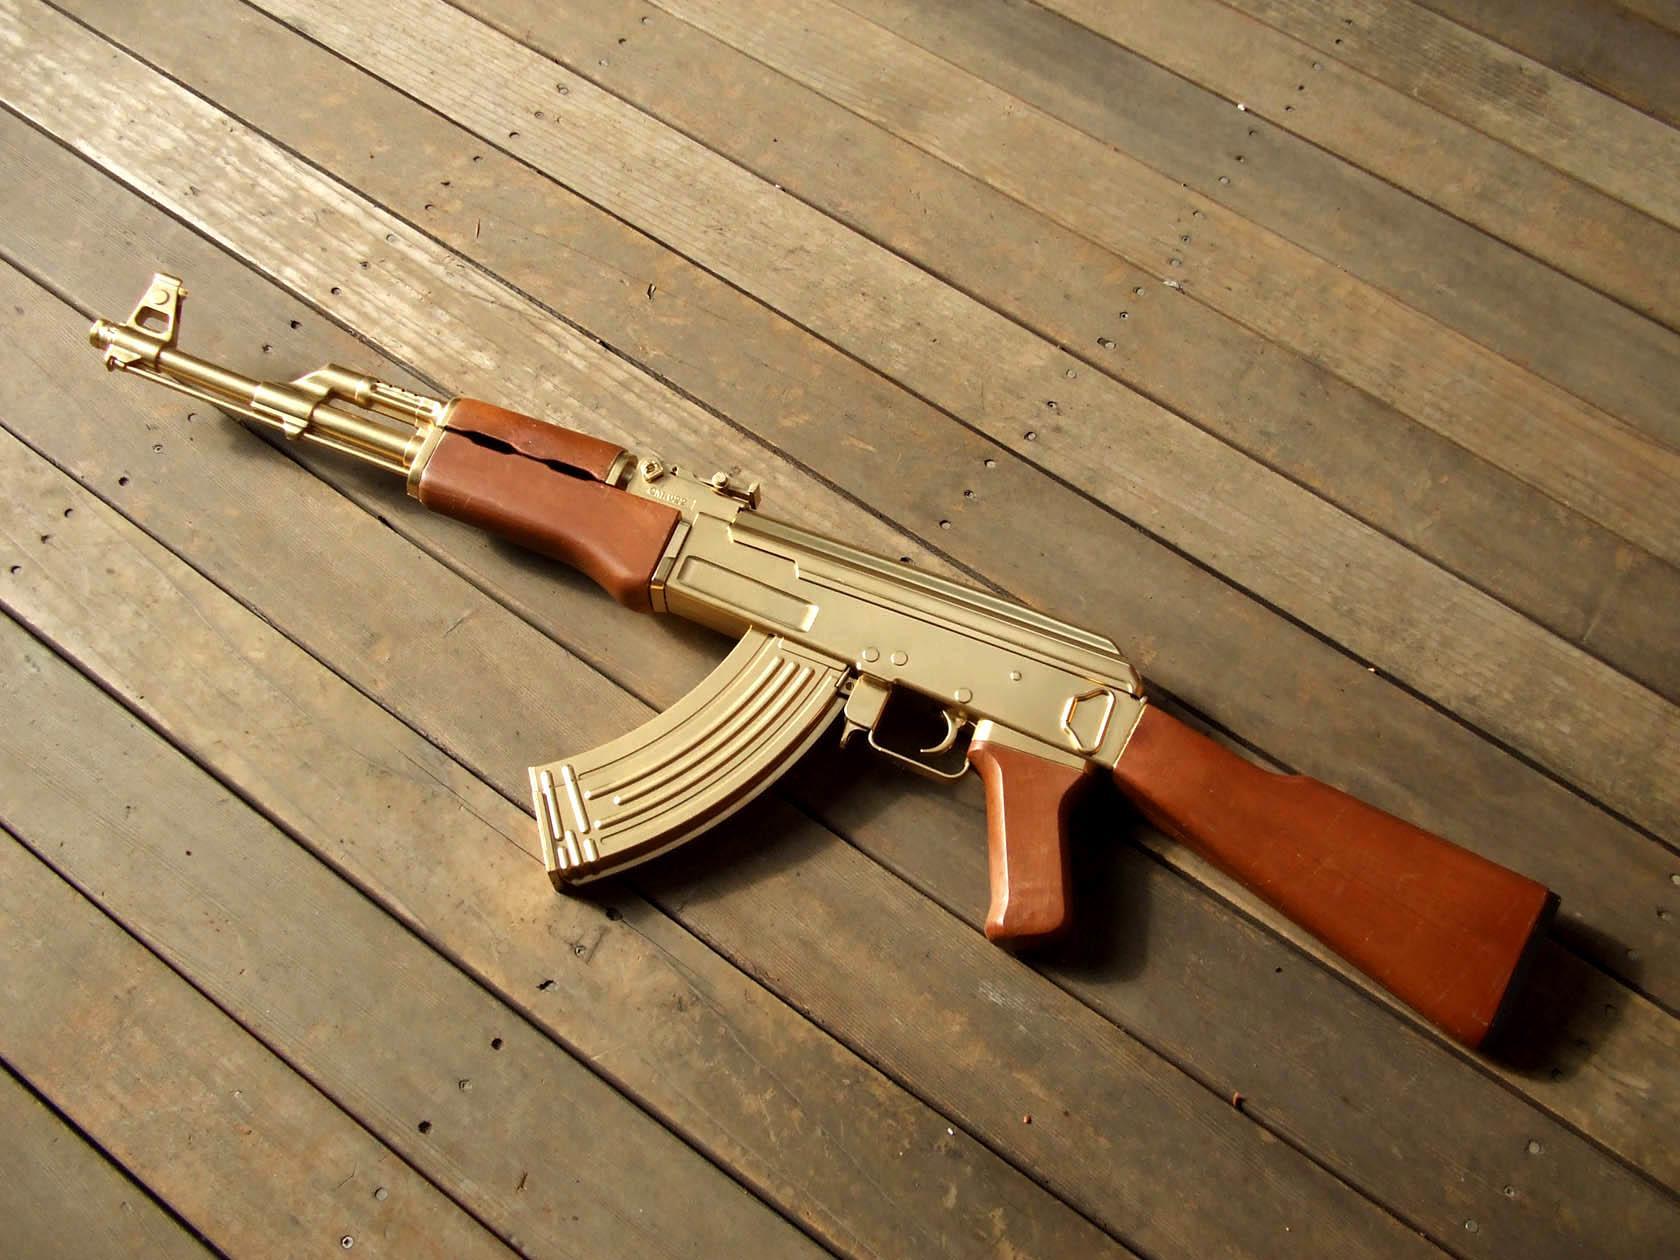 Akm Assault Rifle wallpapers HD quality